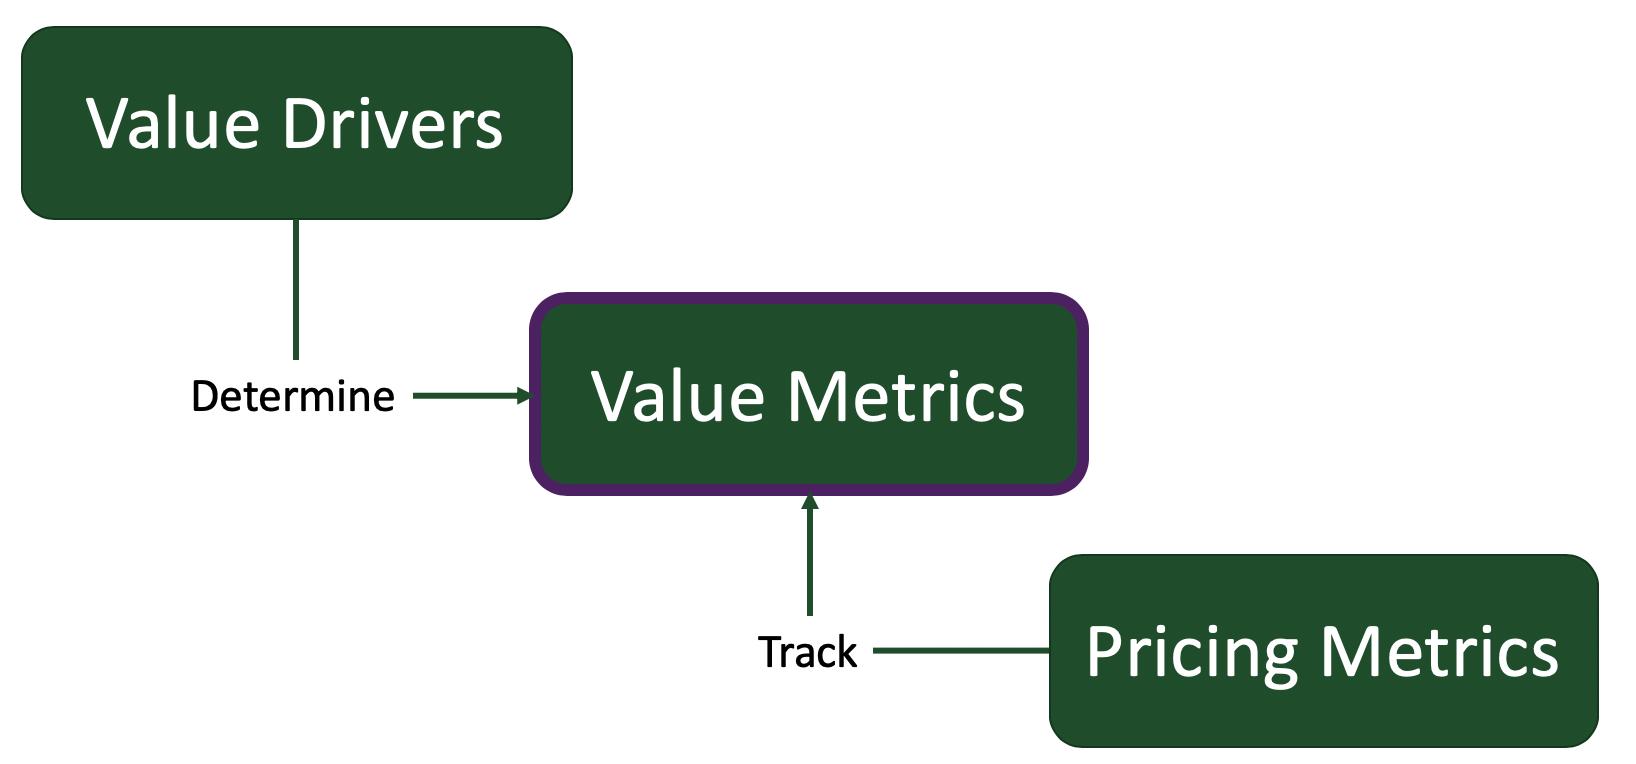 Value Drivers to Value Metrics to Pricing Metrics